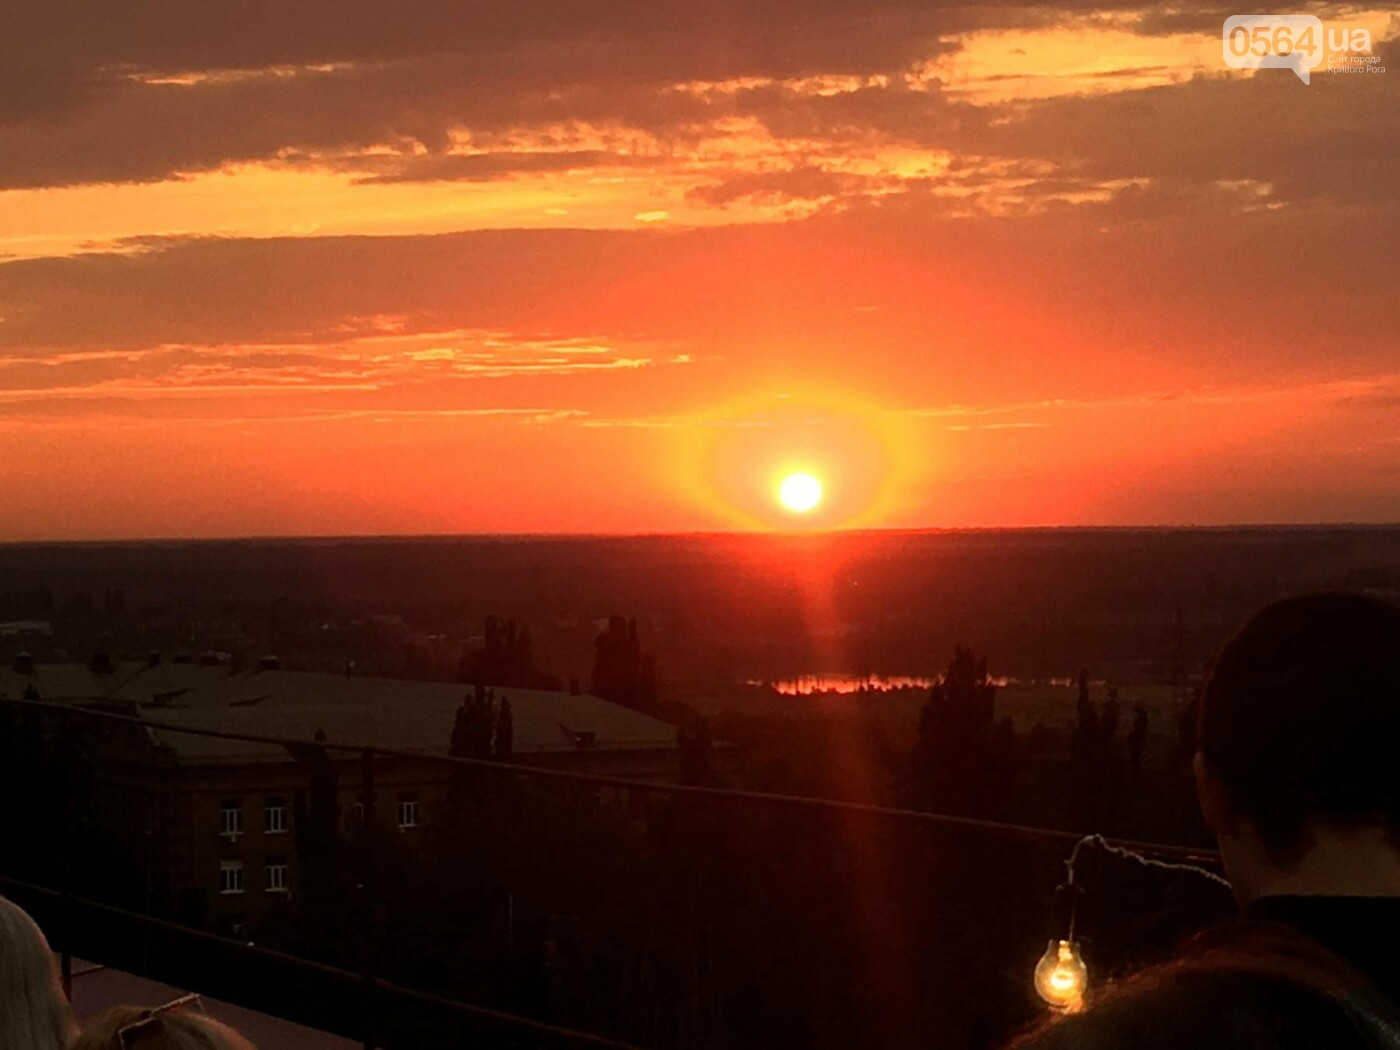 Сотни криворожан встречали закат на крыше отеля под мелодии джаза, - ФОТО, ВИДЕО, фото-4